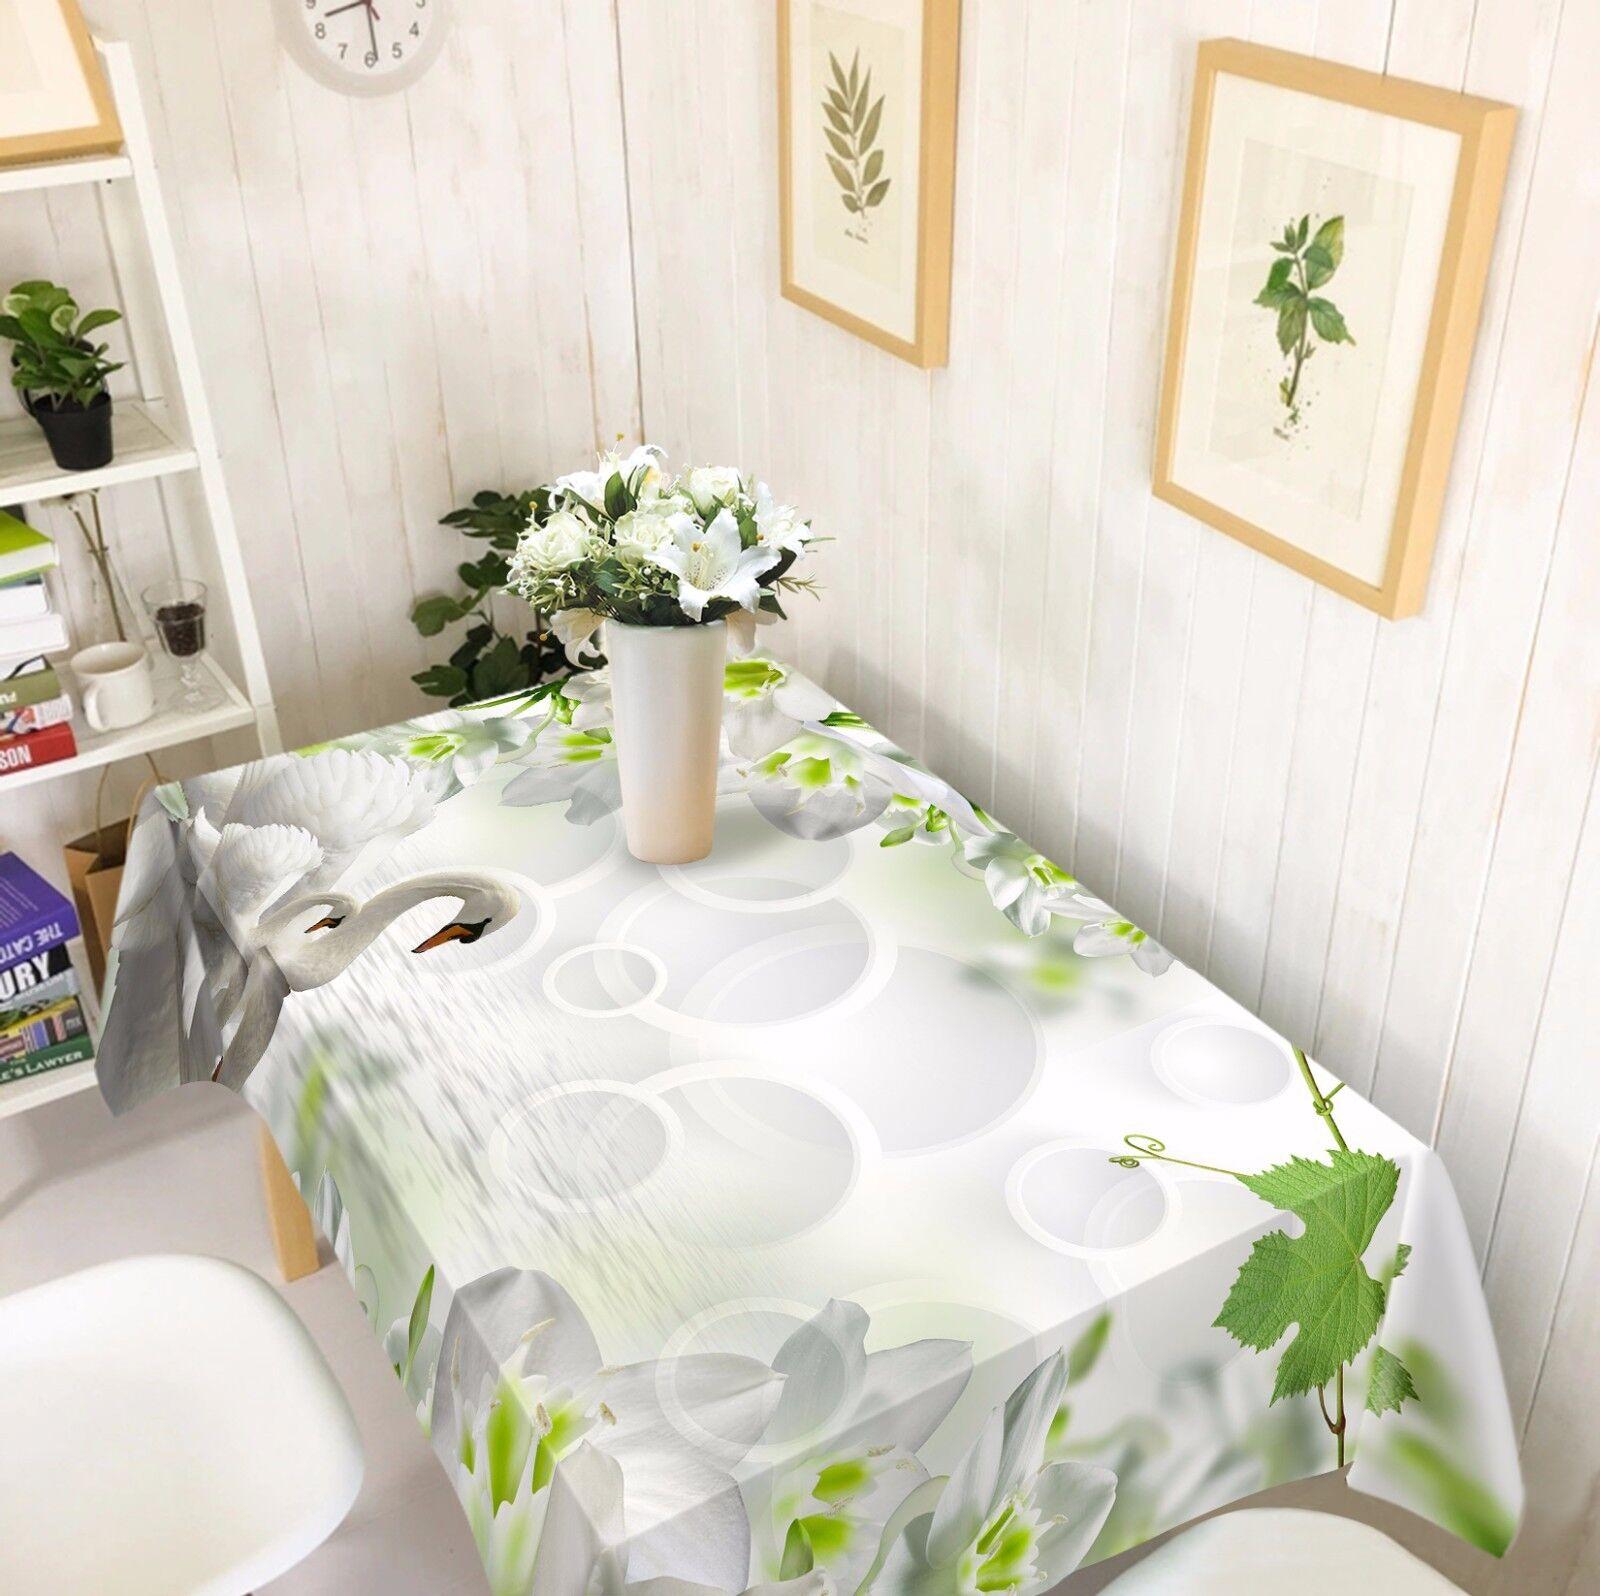 3D Sawn blanco Tablecloth Table Cover Cloth Birthday Party AJ WALLPAPER Lemon